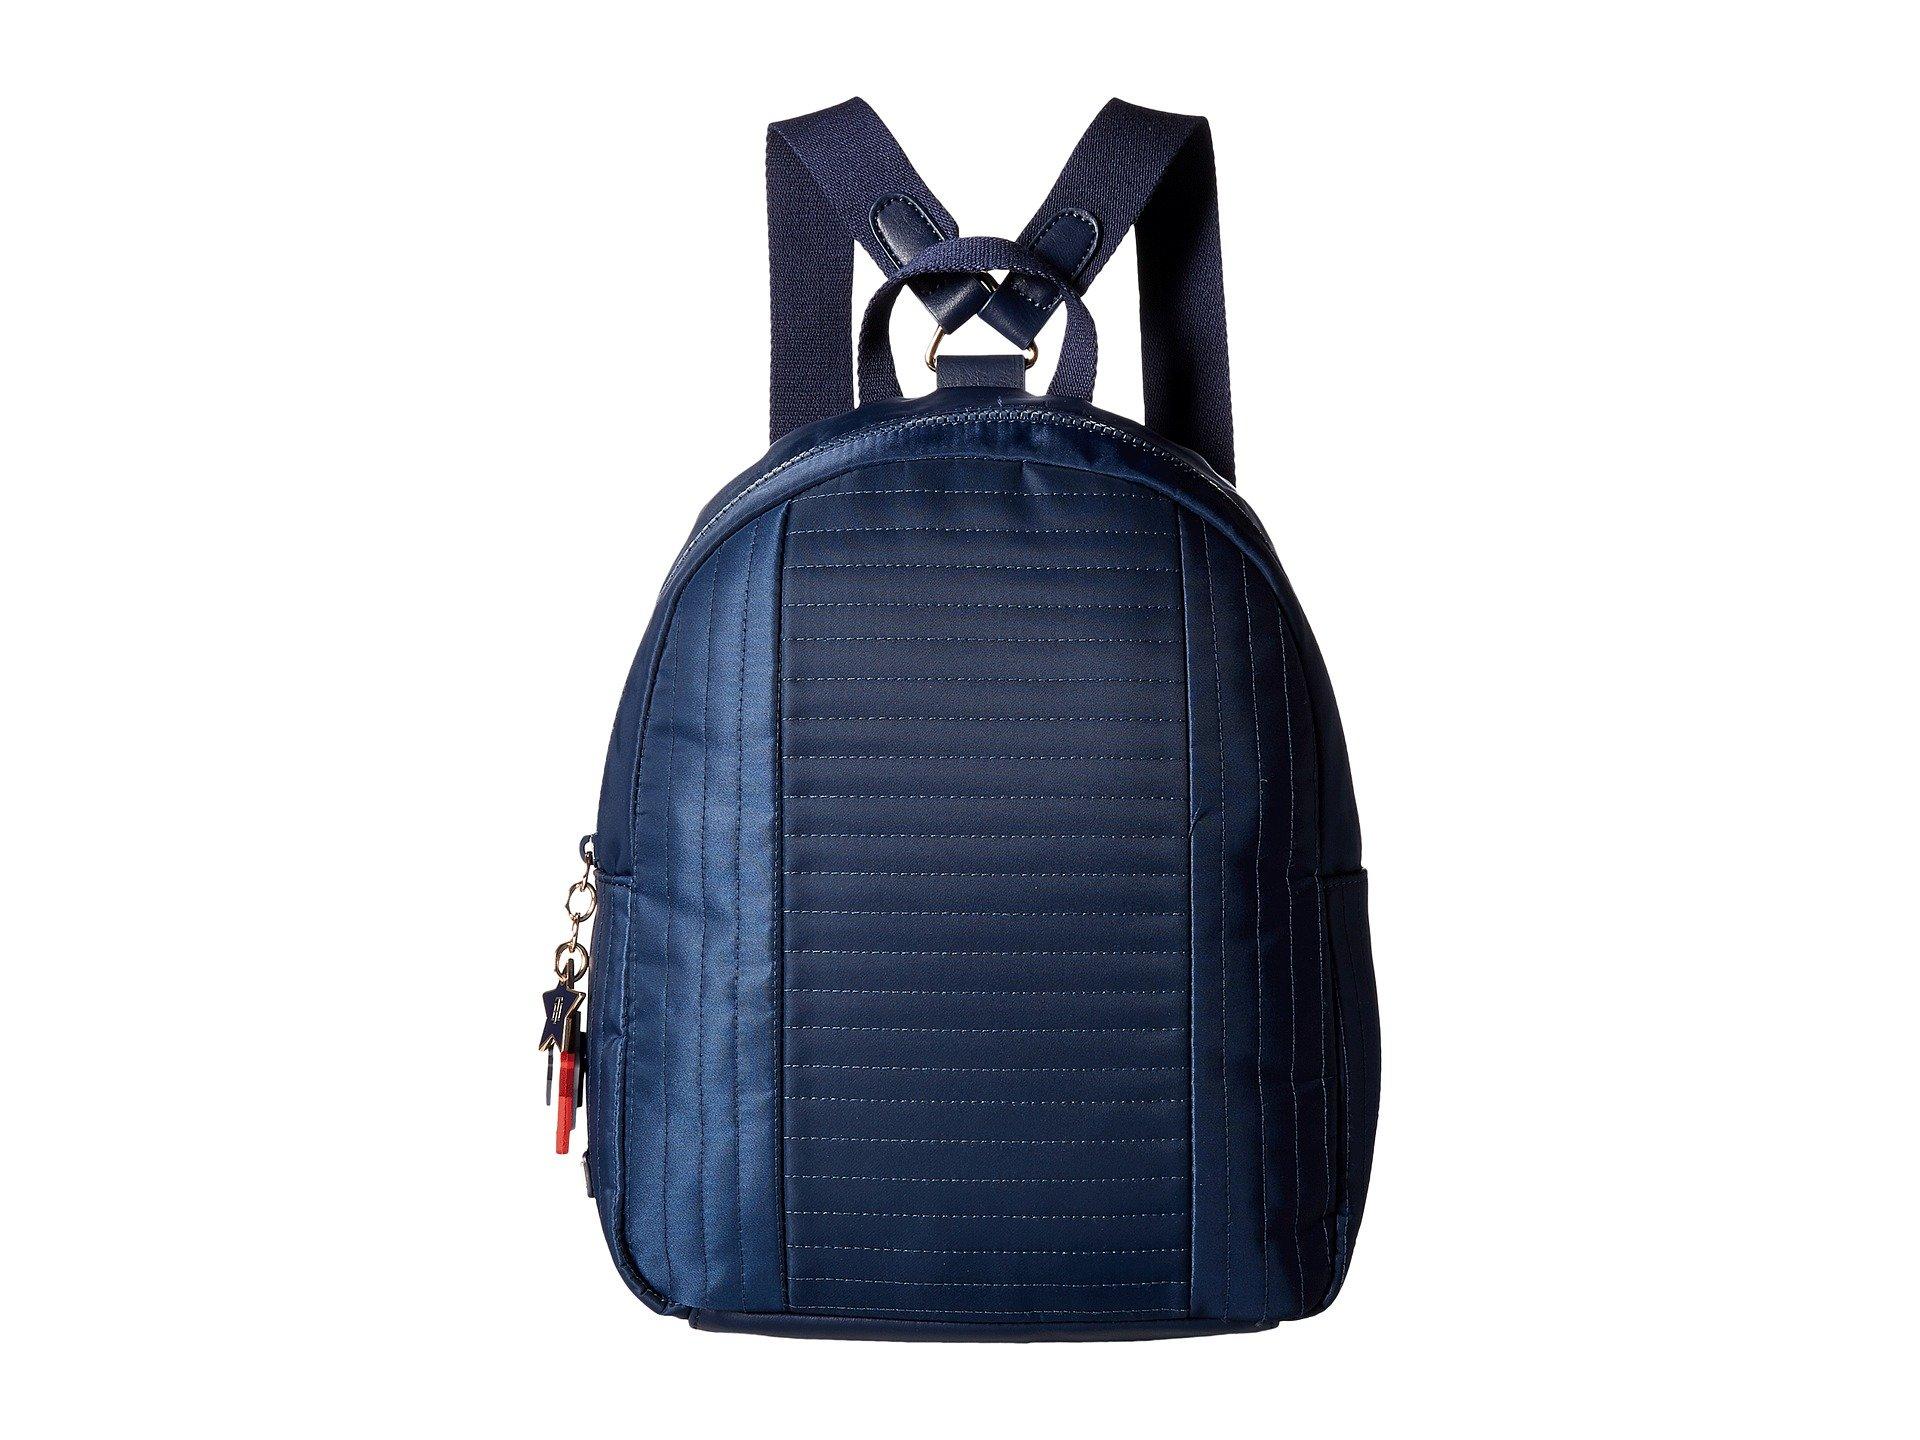 Tommy Hilfiger Calandra Dome Backpack At 6pm